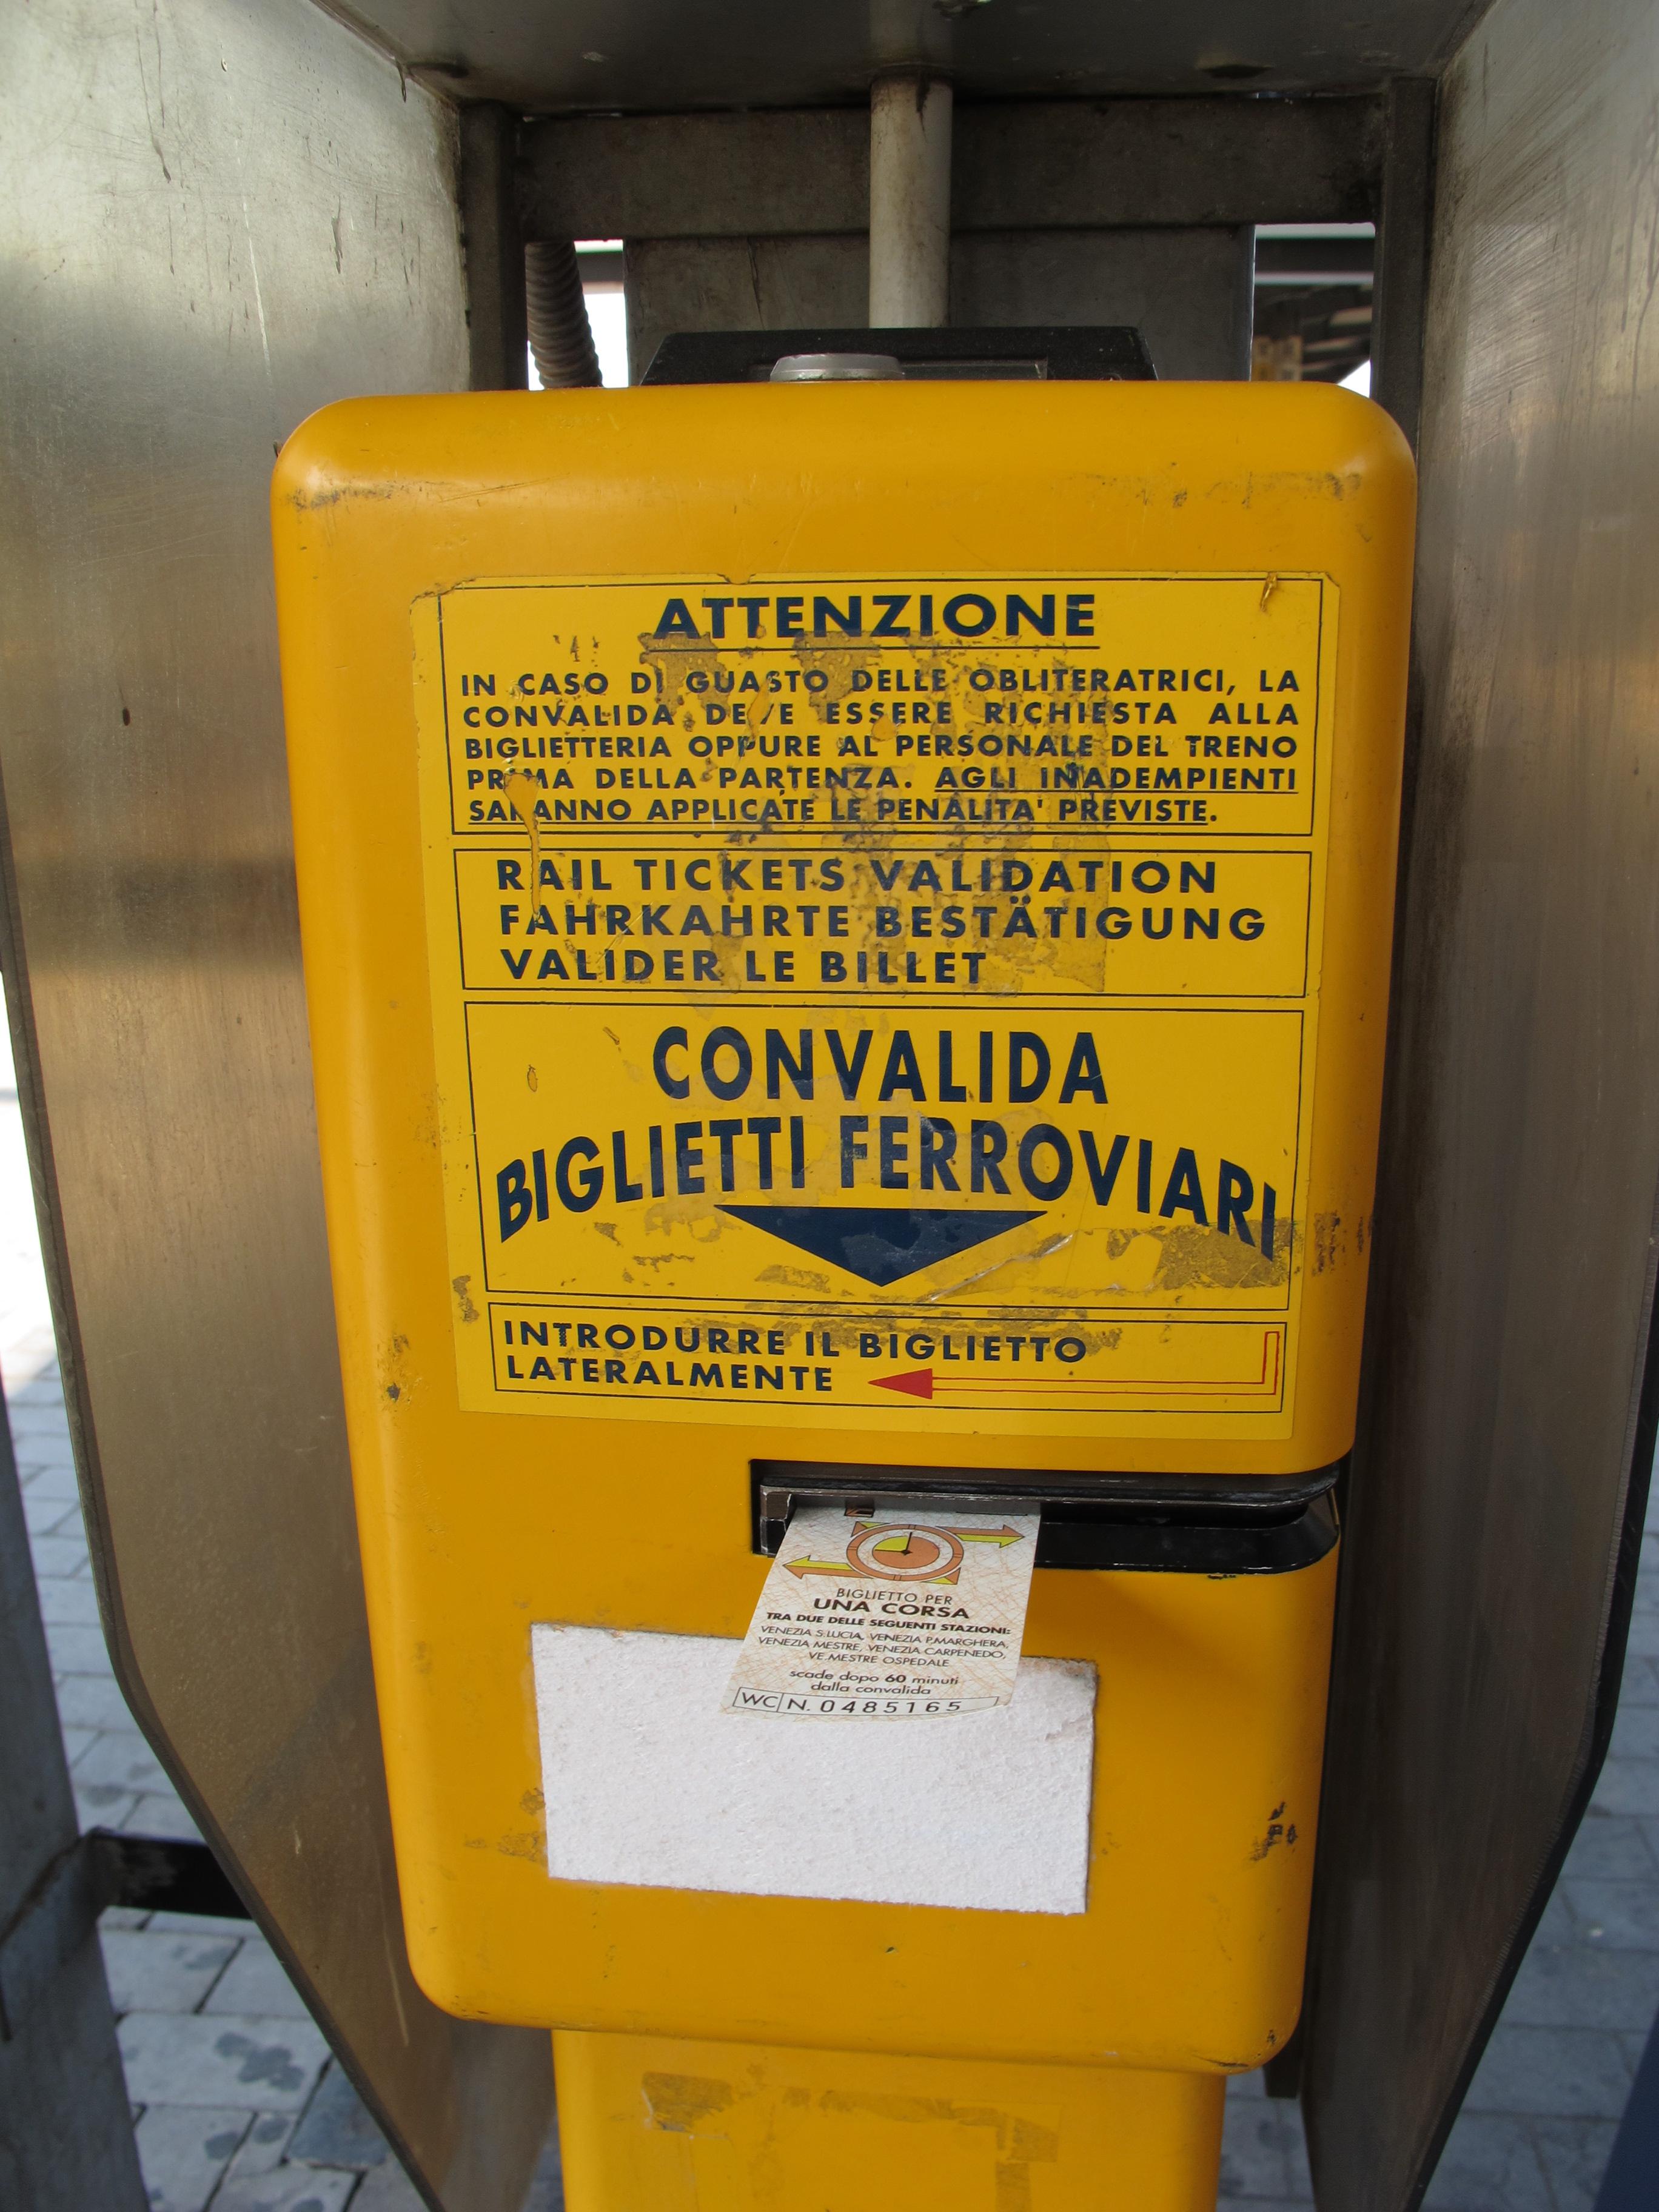 Máquina para Validar Tickets, esta em Veneza Mestre